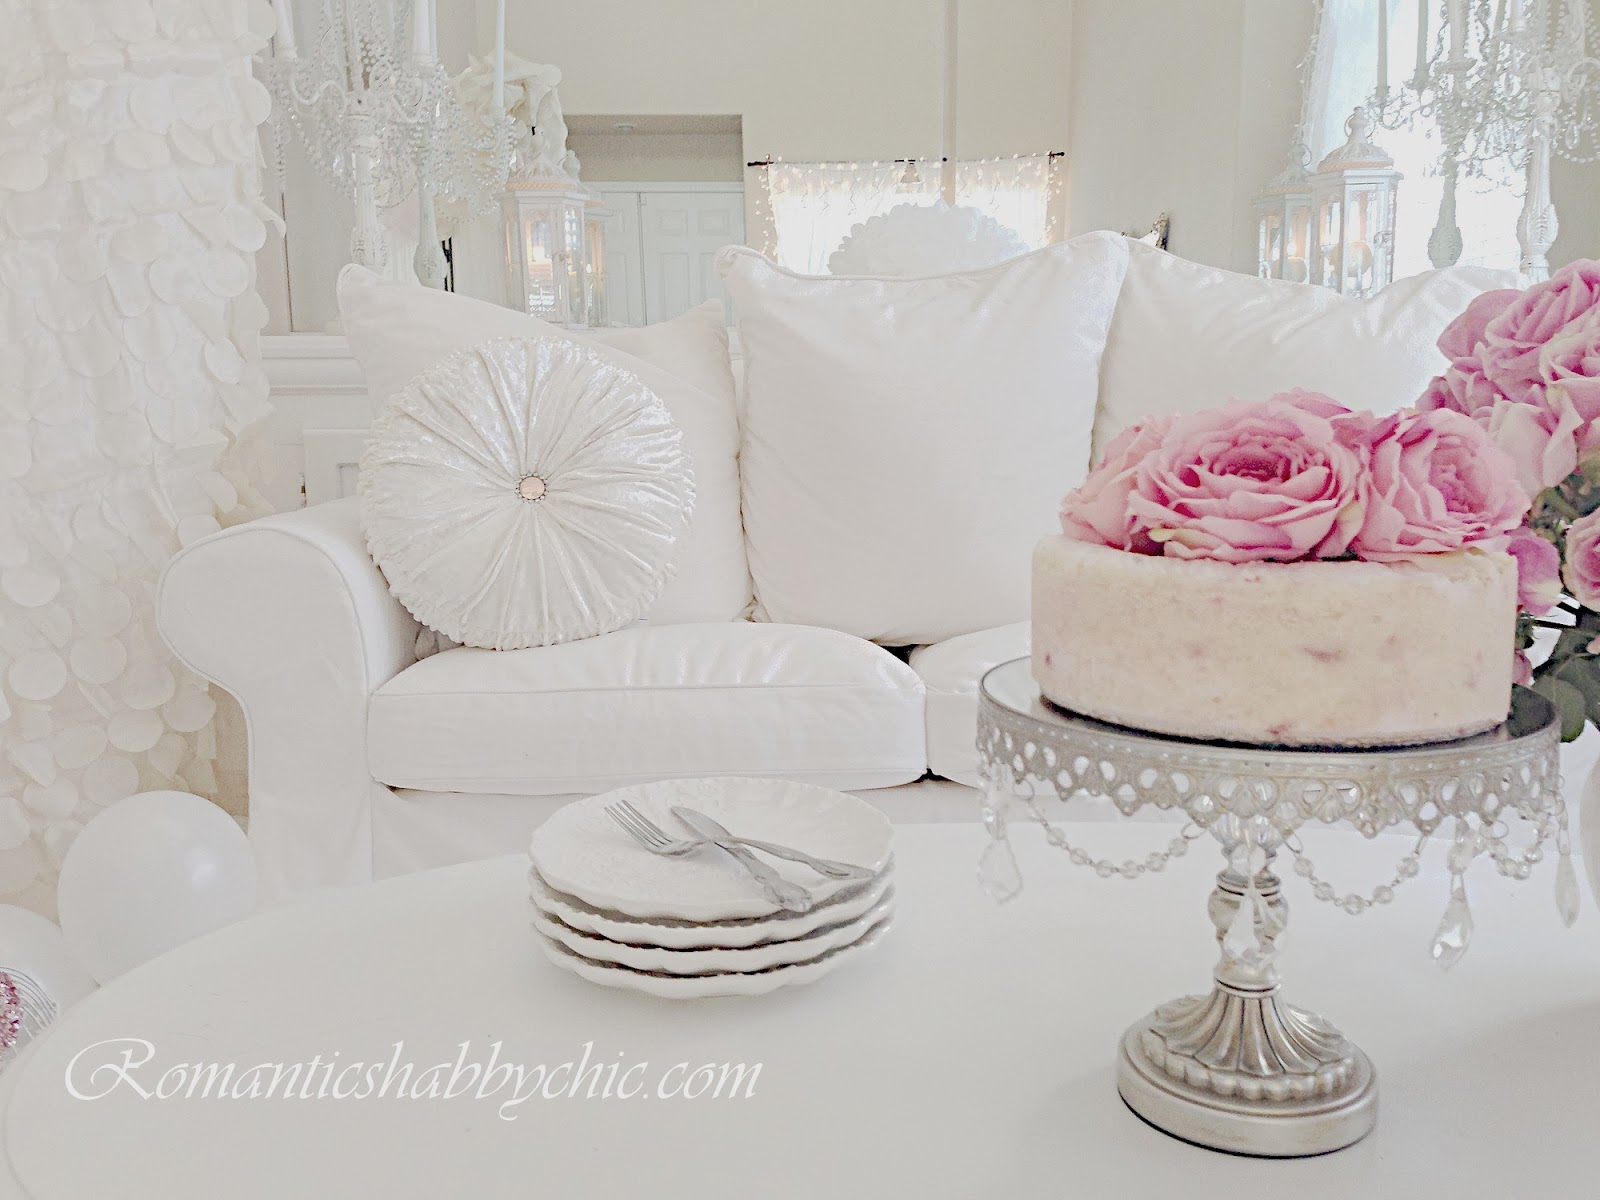 Magnificent Romantic Shabby Chic Home Romantic Shabby Chic Blog Download Free Architecture Designs Parabritishbridgeorg